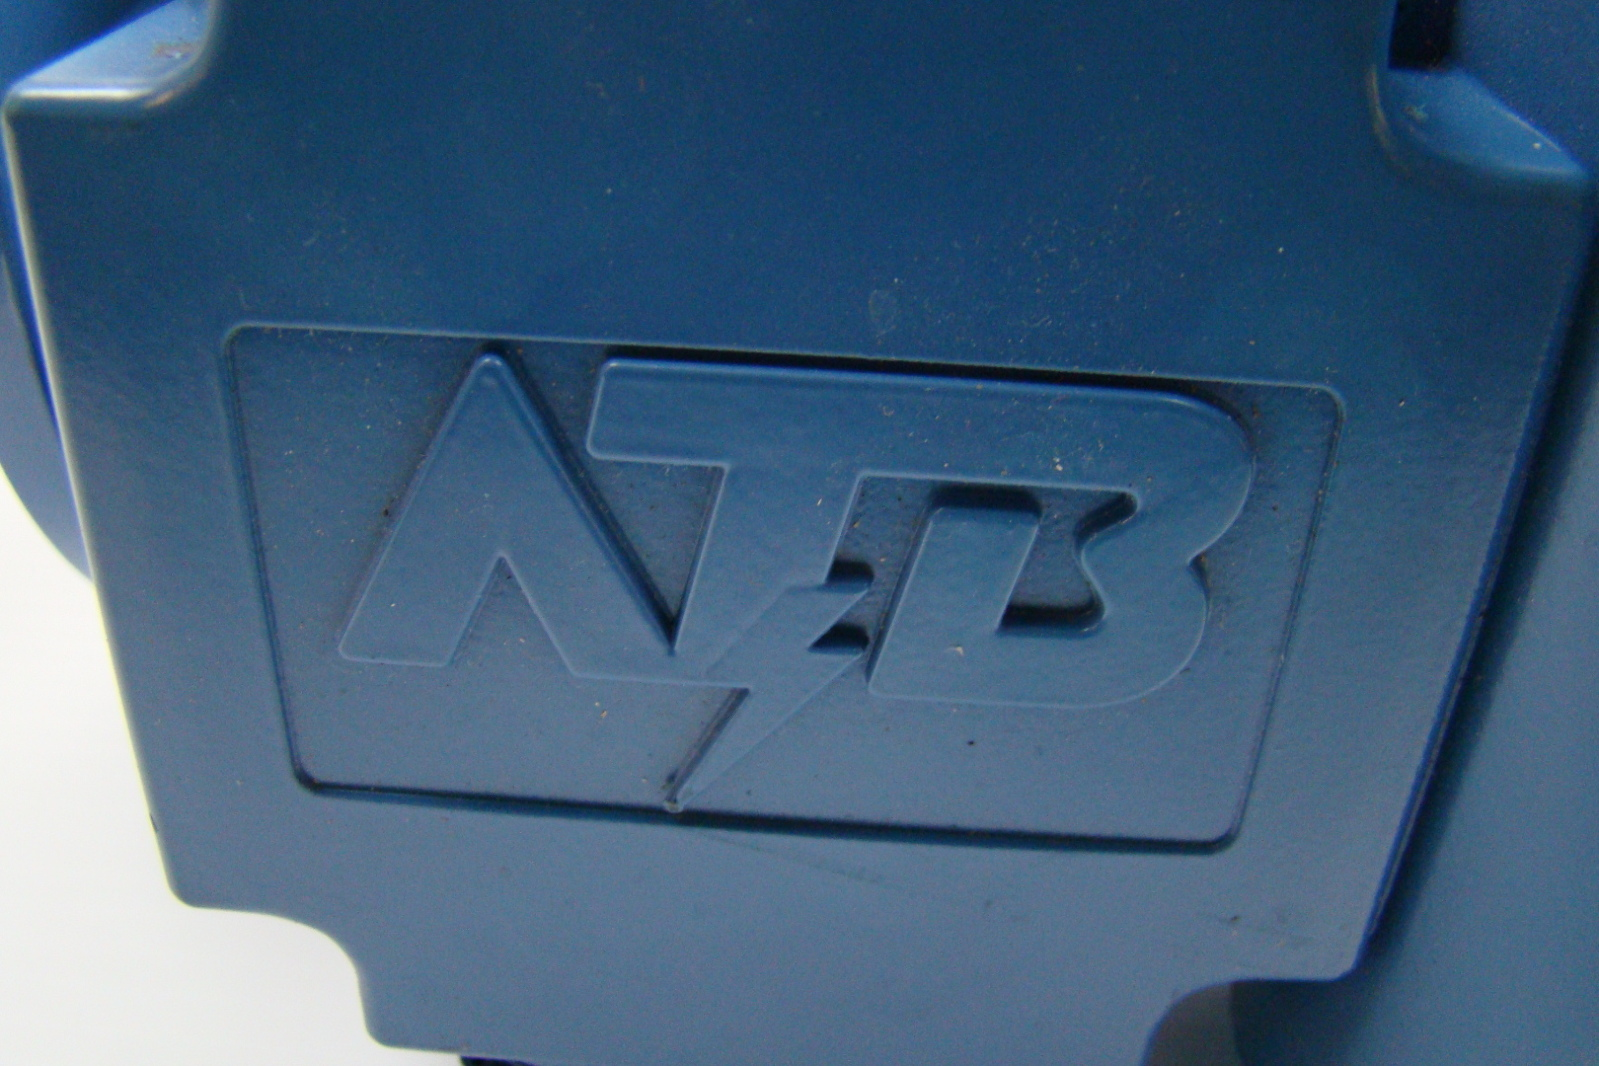 ATB .30kW 220-240v Electric Motor NGF71/4C-11R | eBay